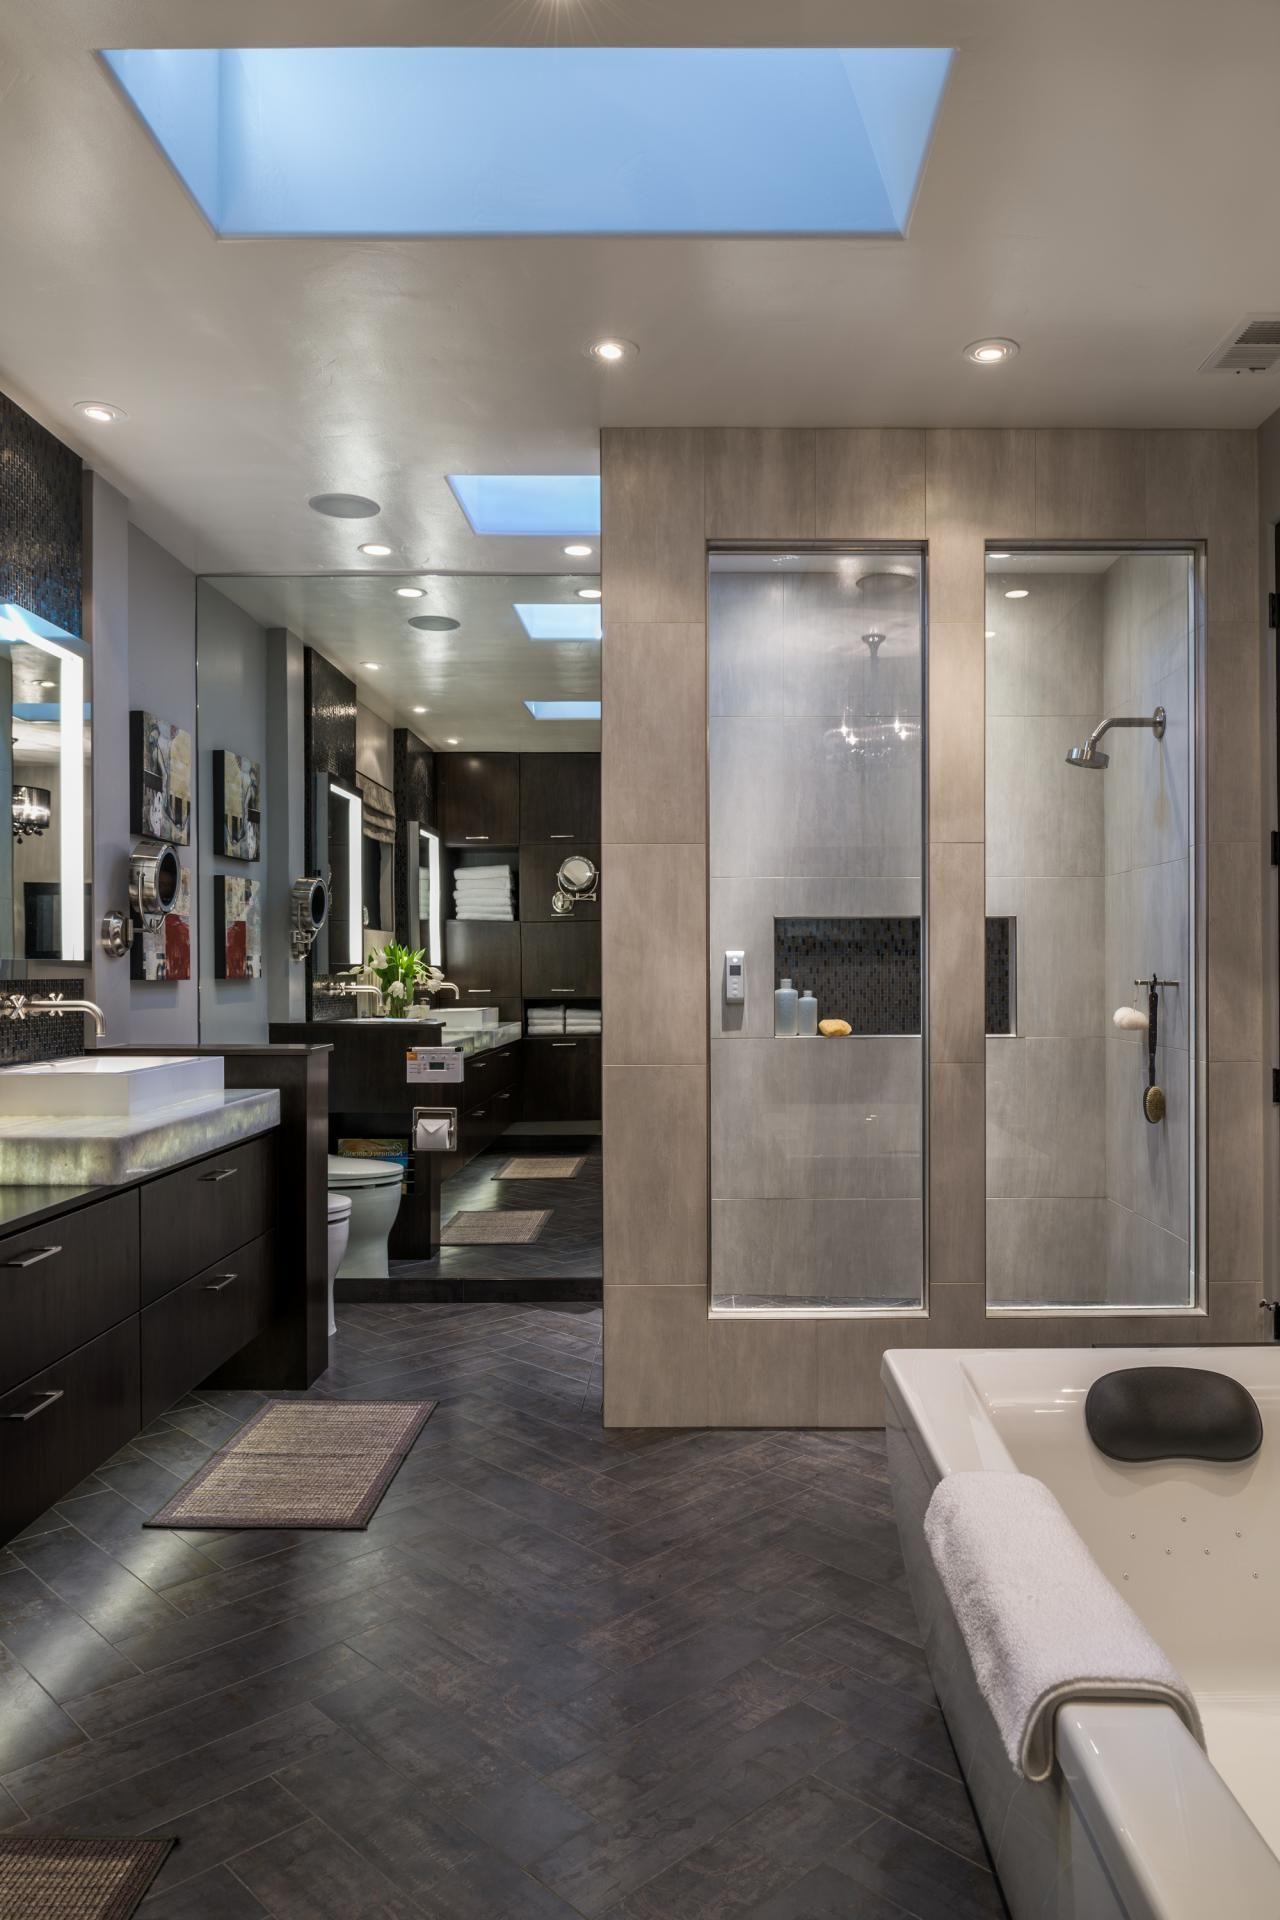 Most Serene Retreat Contemporary Master Bathroom Modern Master Bathroom Contemporary Bathroom Designs